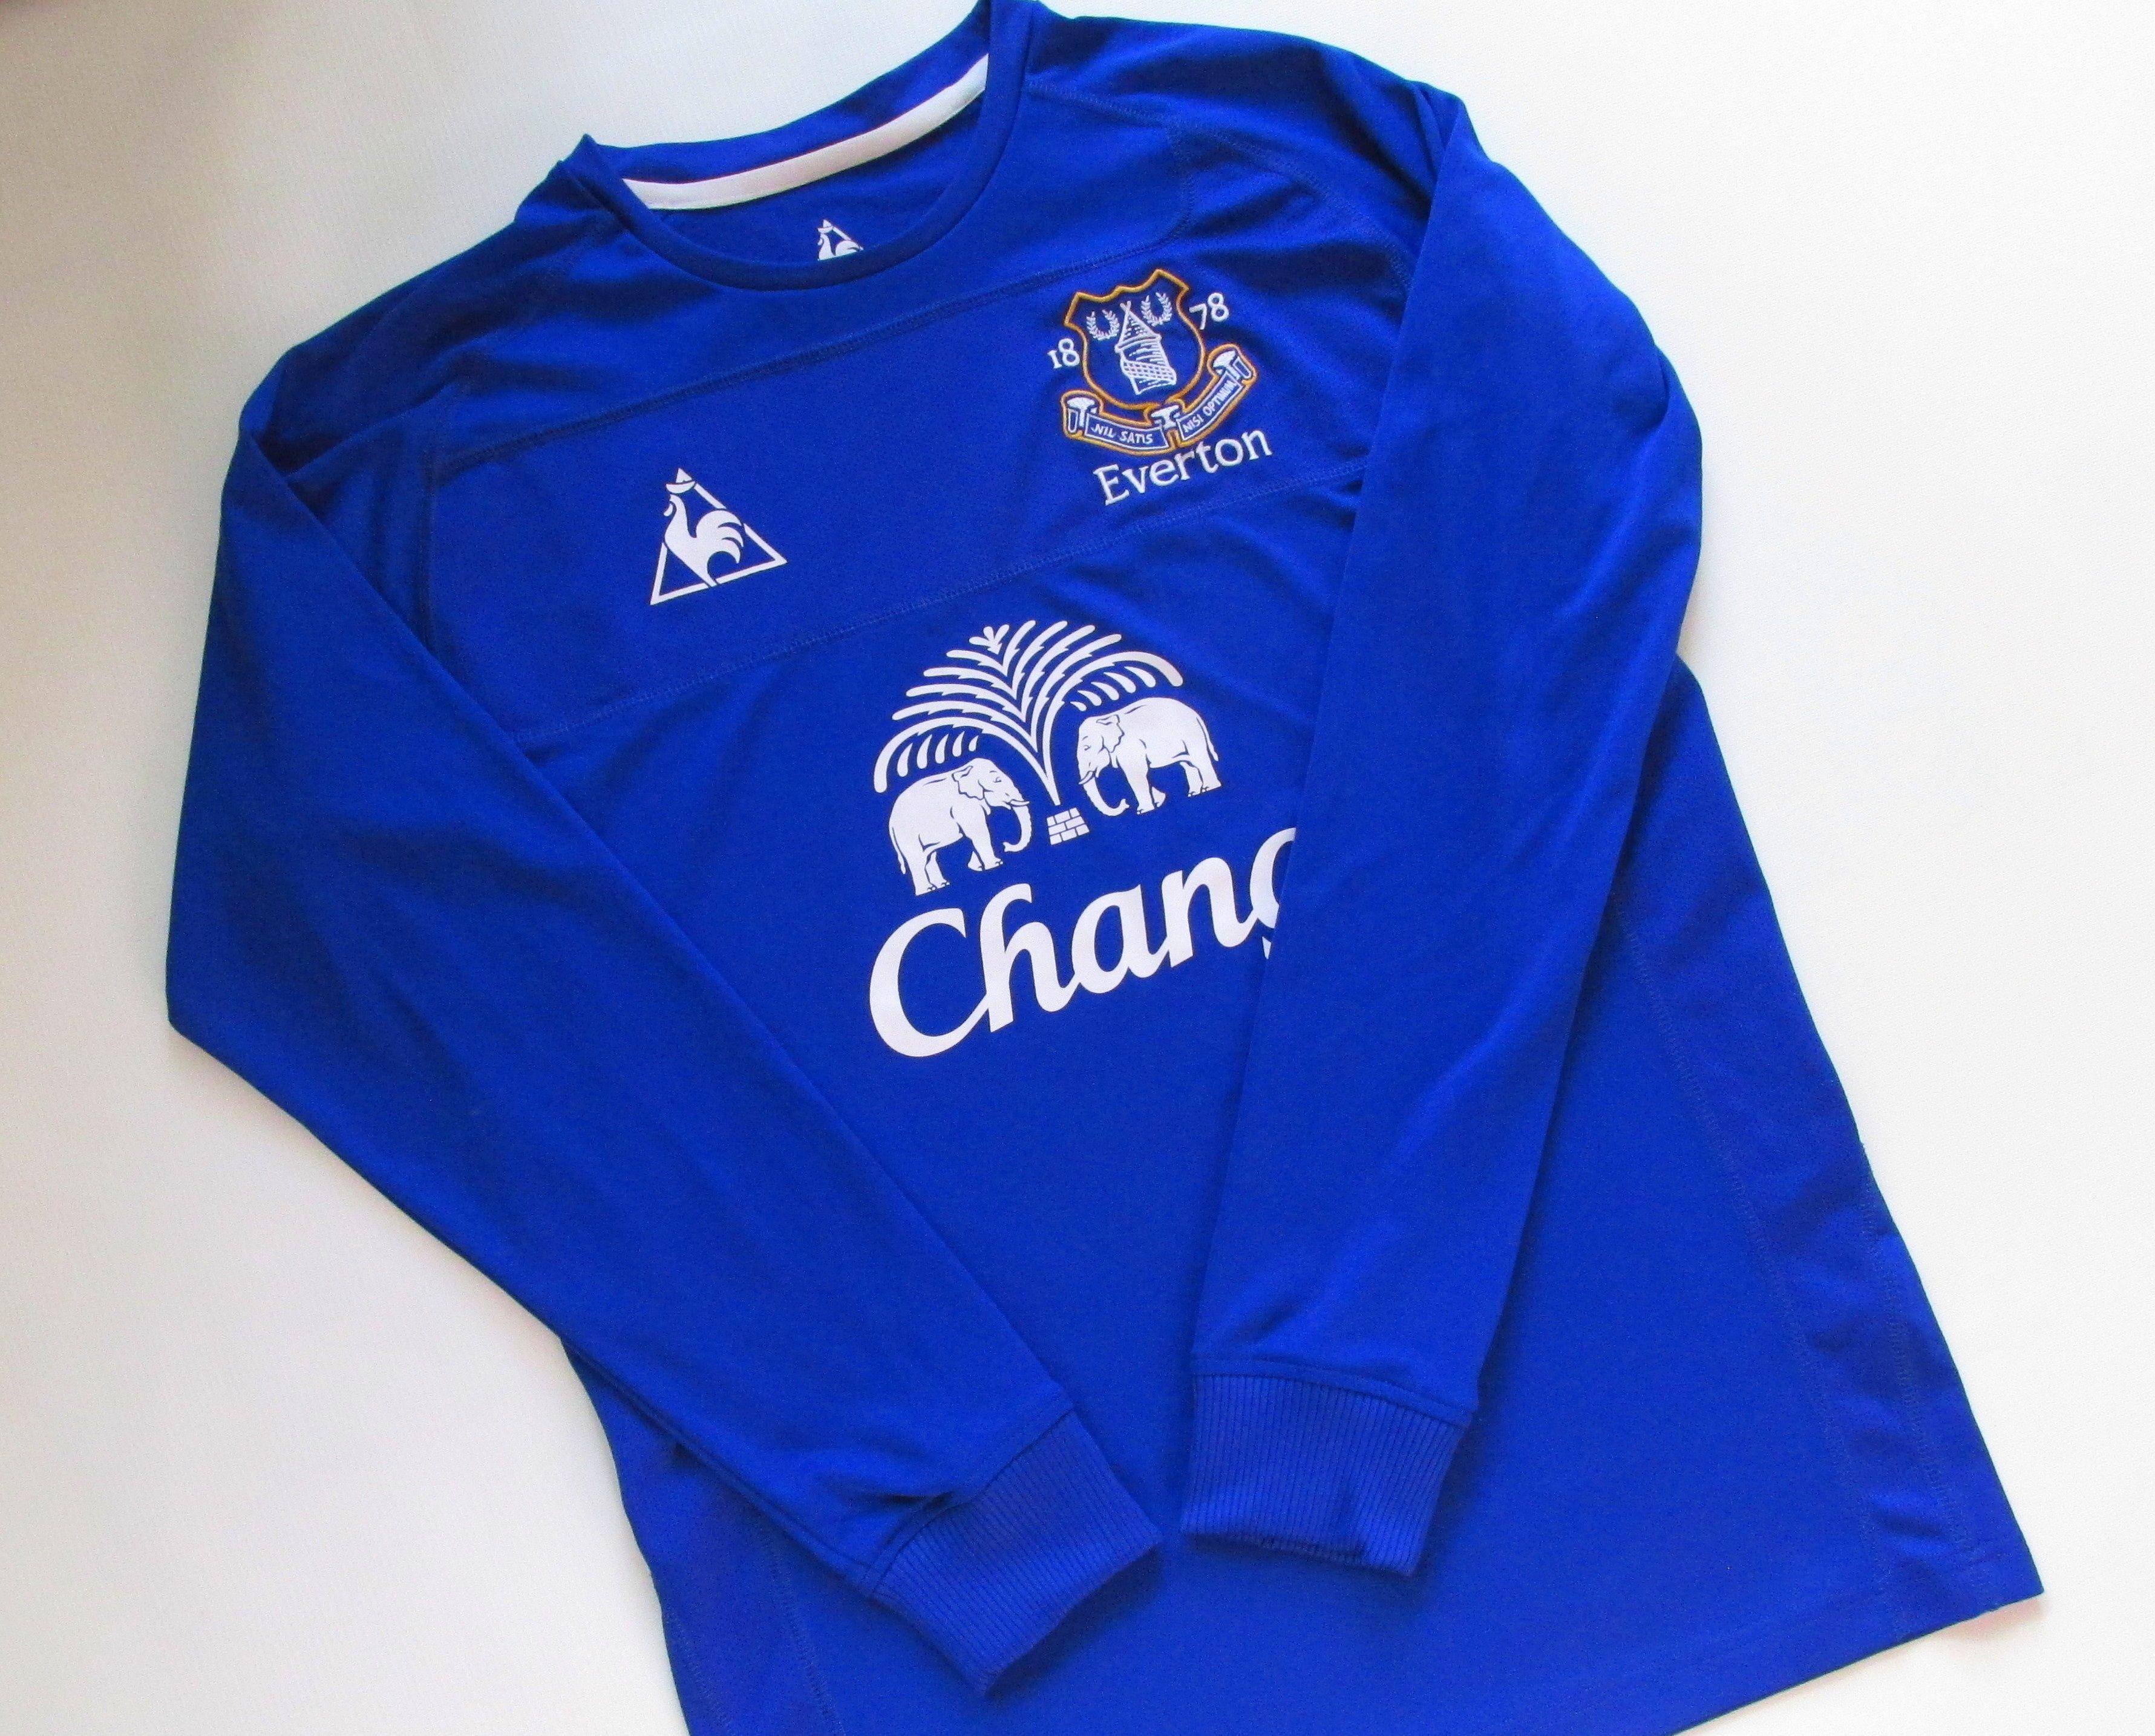 Everton 2010 2011 Home Long Sleeve Football Shirt Football Shirts Vintage Football Shirts Soccer Jersey [ 2870 x 3562 Pixel ]